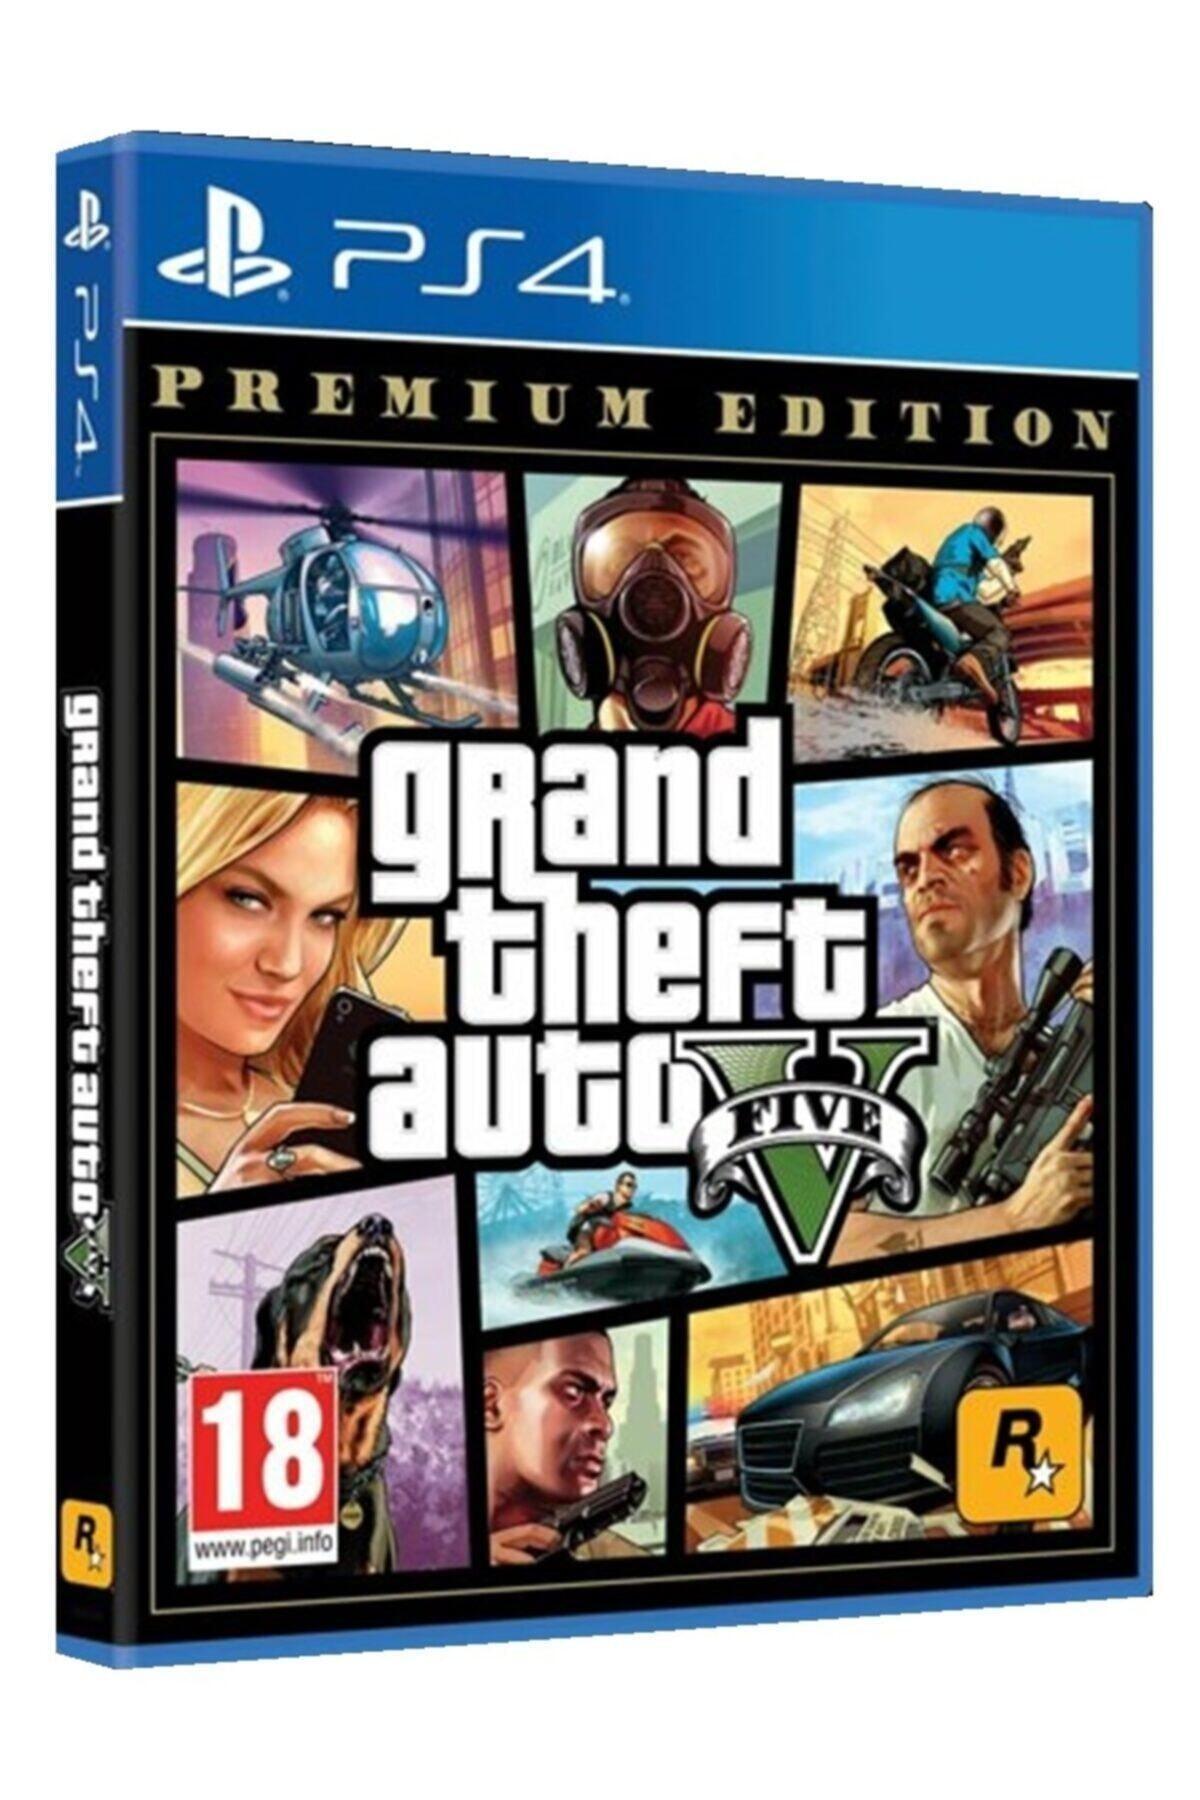 Ps4 Grand Theft Auto 5 Premium Edıtıon Gta 5 Oyun Orjinal